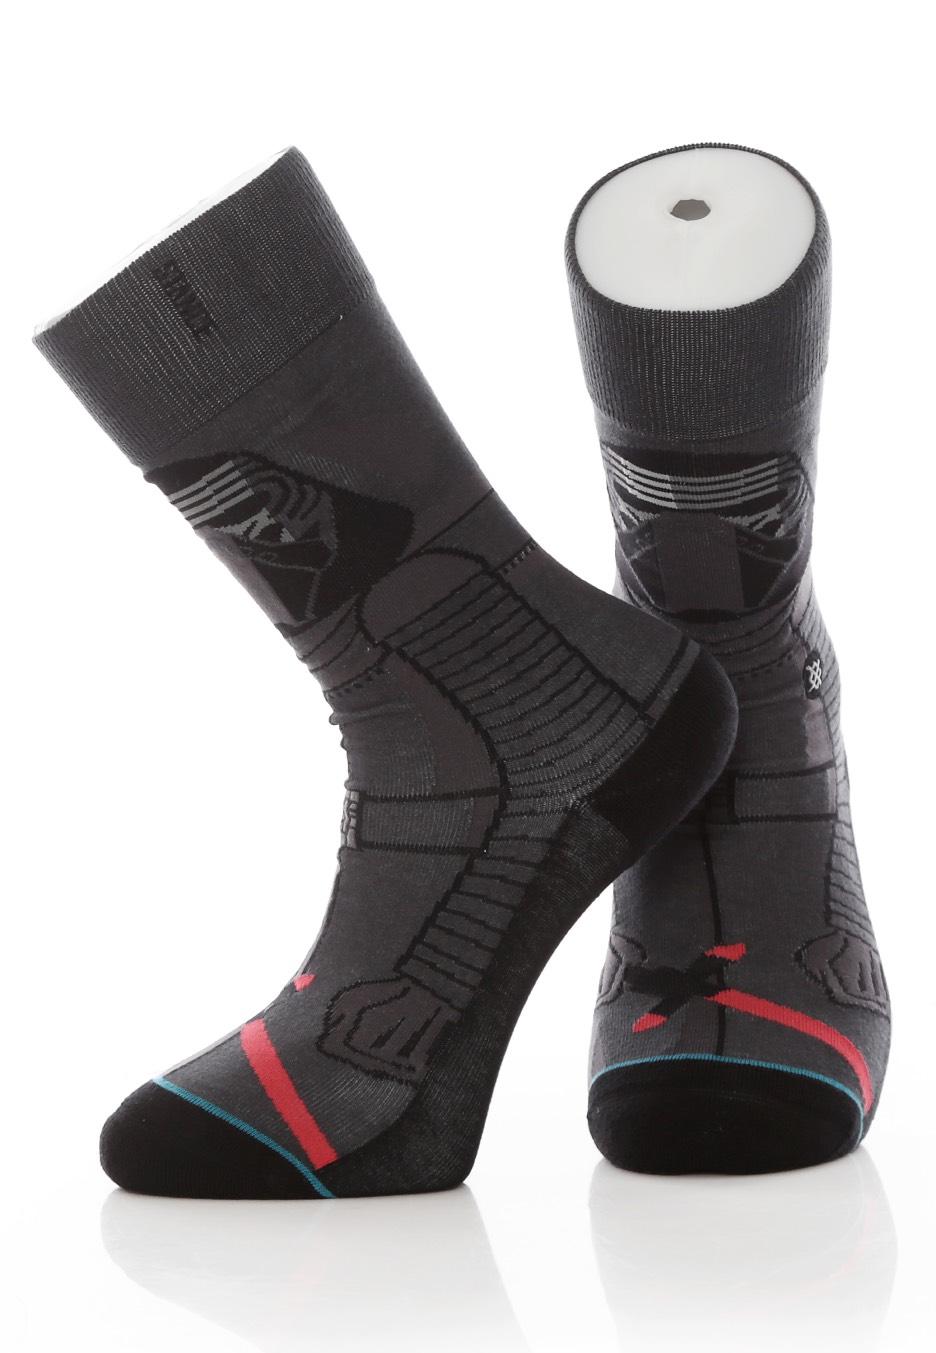 694d27b0b7 Stance x Star Wars - Kylo Ren Dark Grey - Socken - Streetwear Shop ...